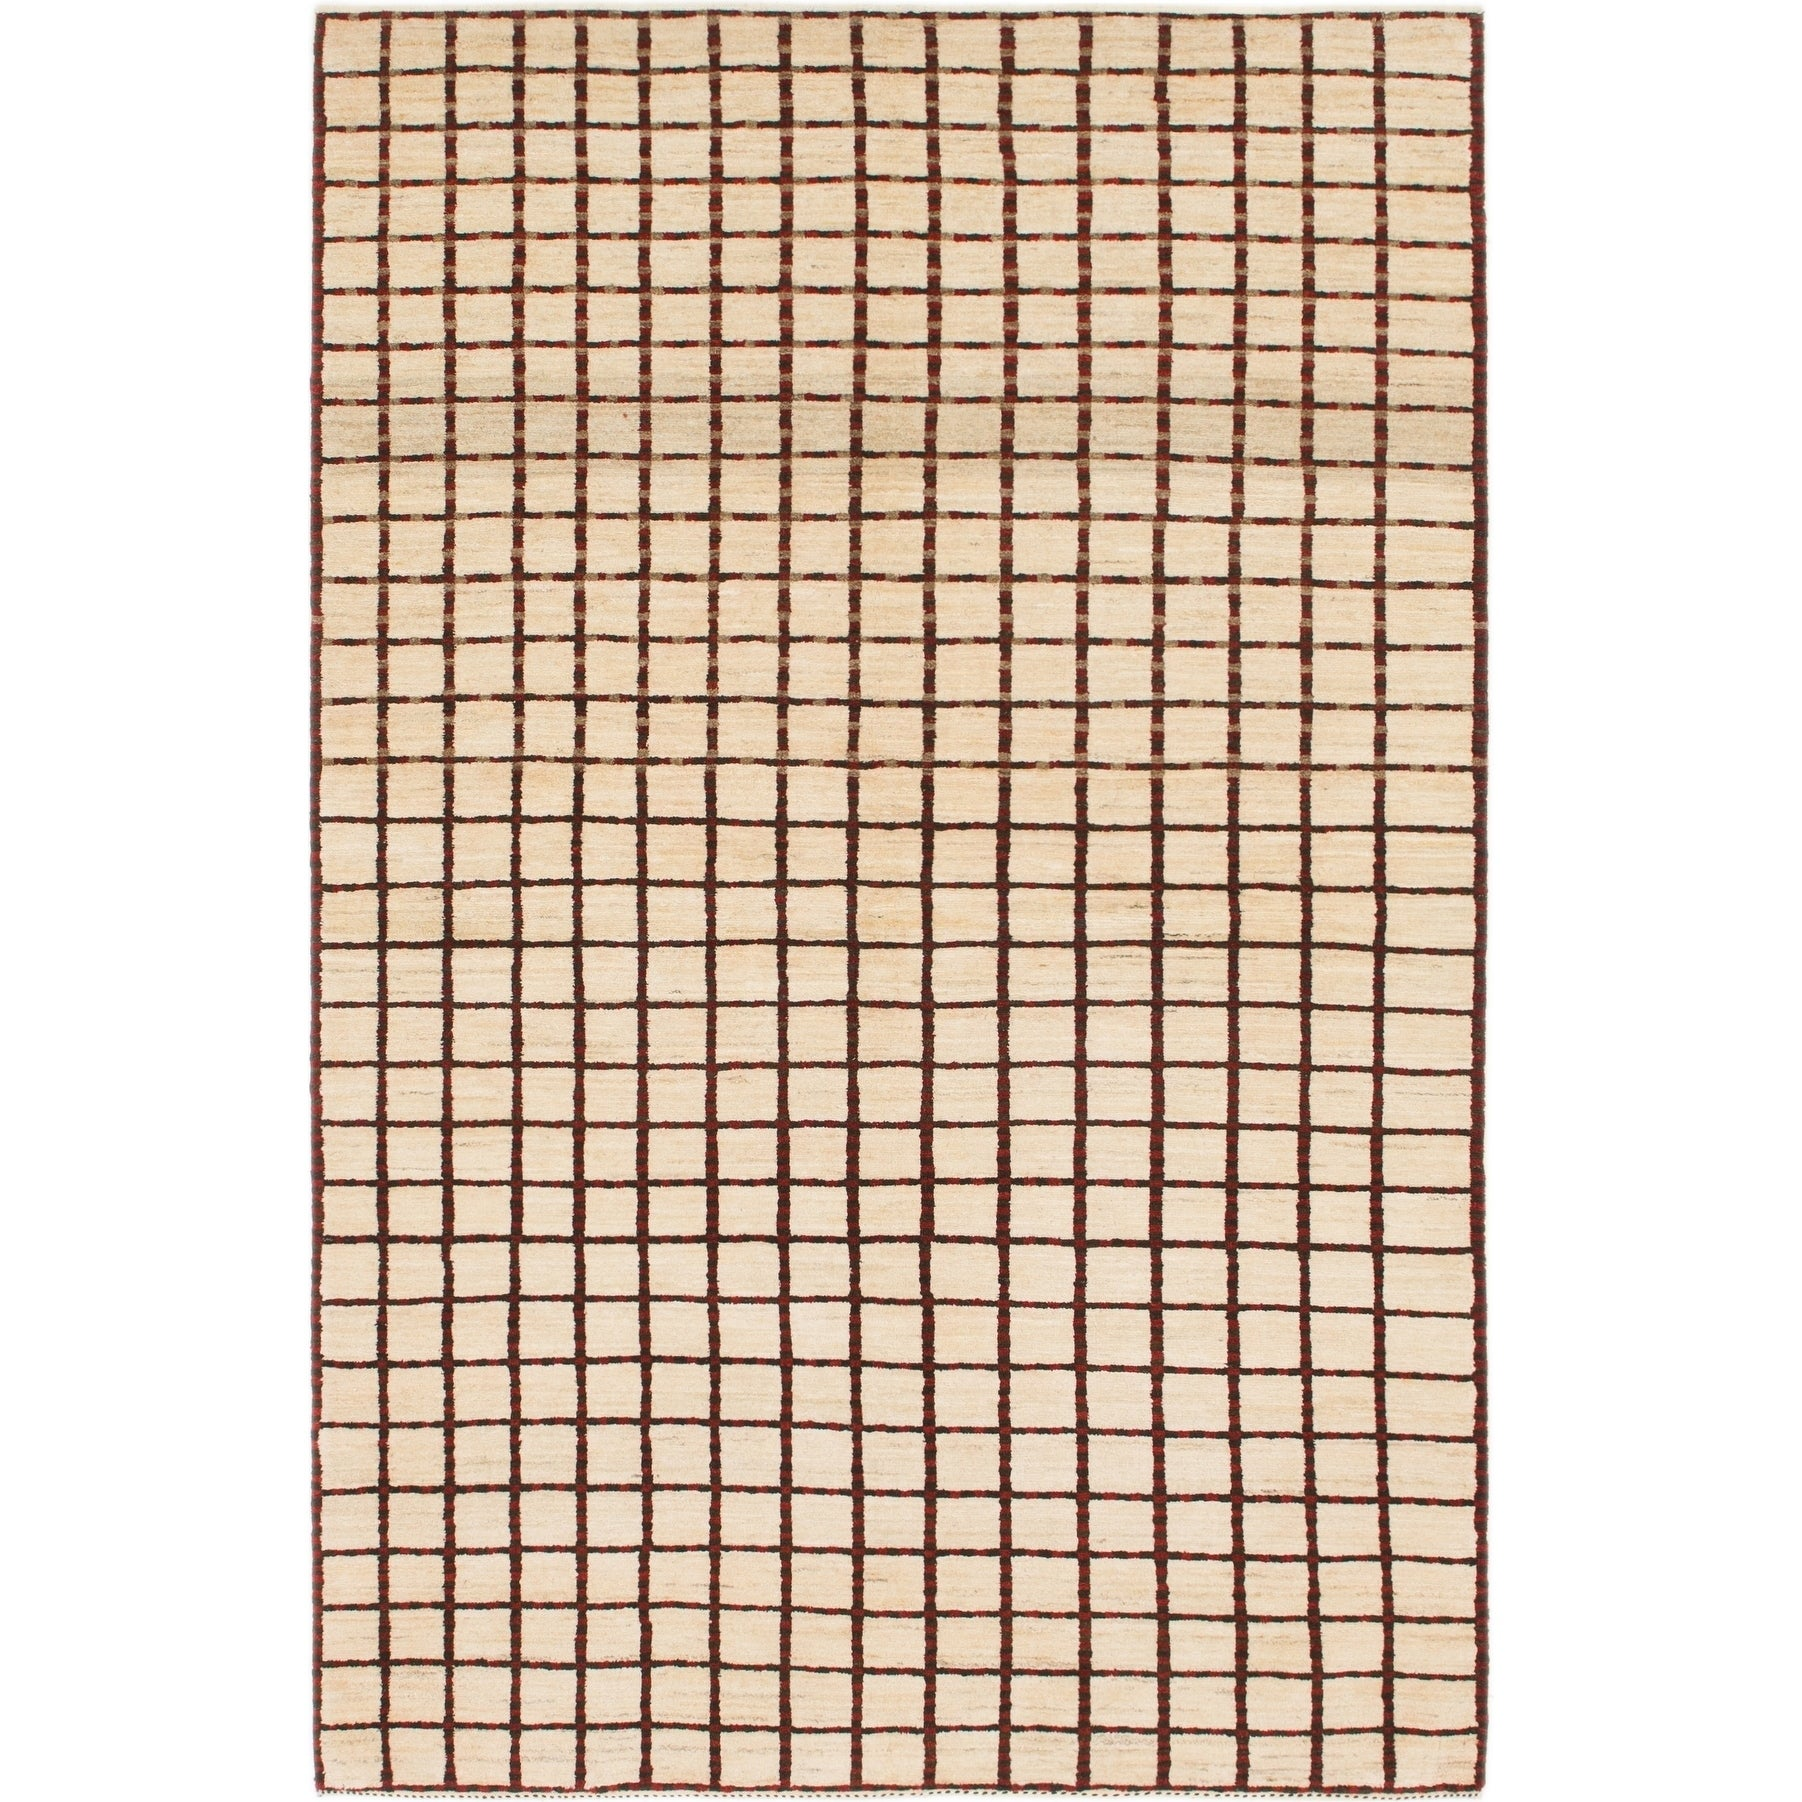 Hand Knotted Kashkuli Gabbeh Wool Area Rug - 5 4 x 8 2 (Cream - 5 4 x 8 2)